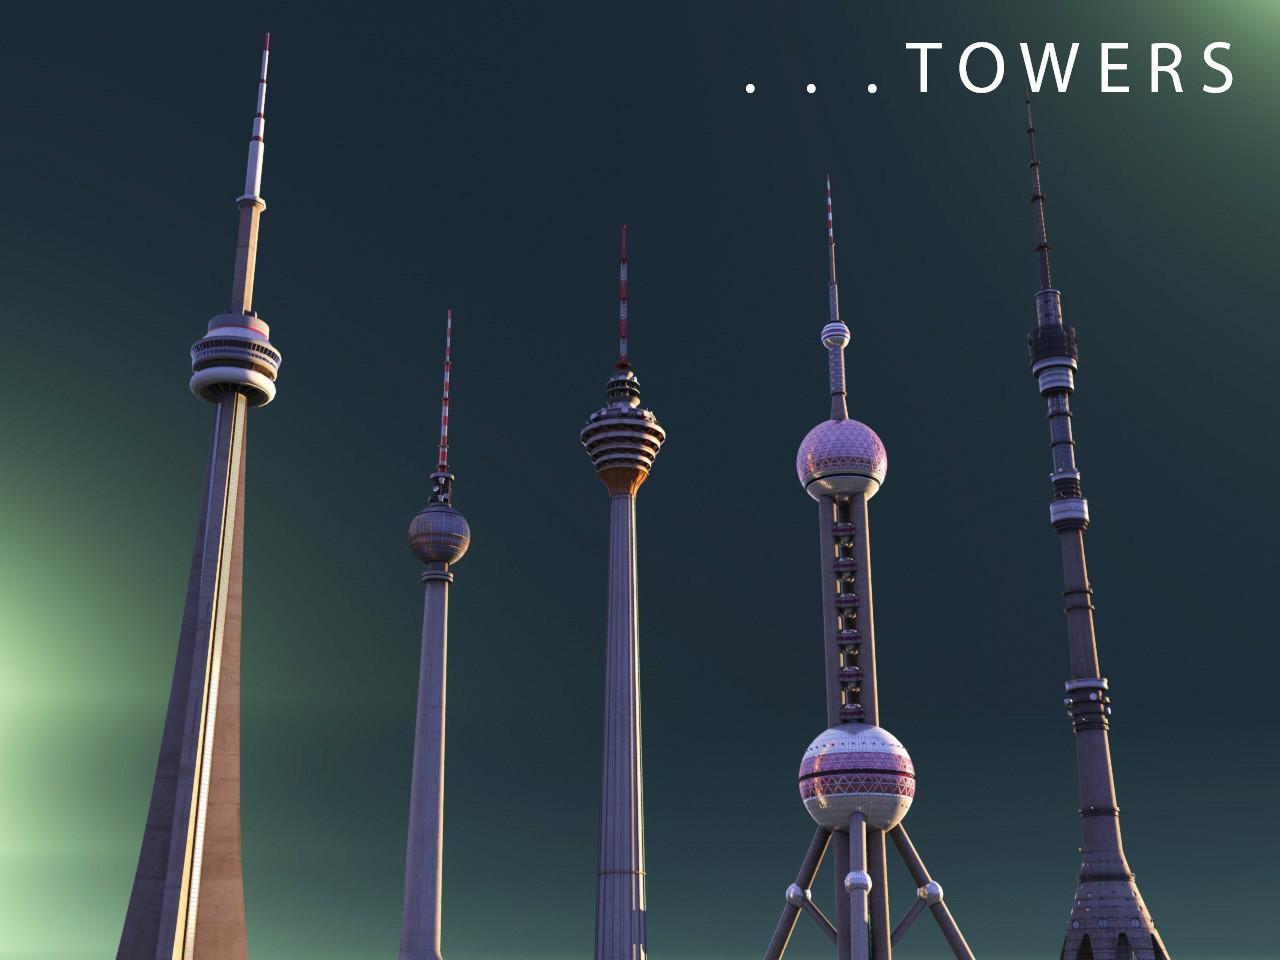 towers_all.jpg